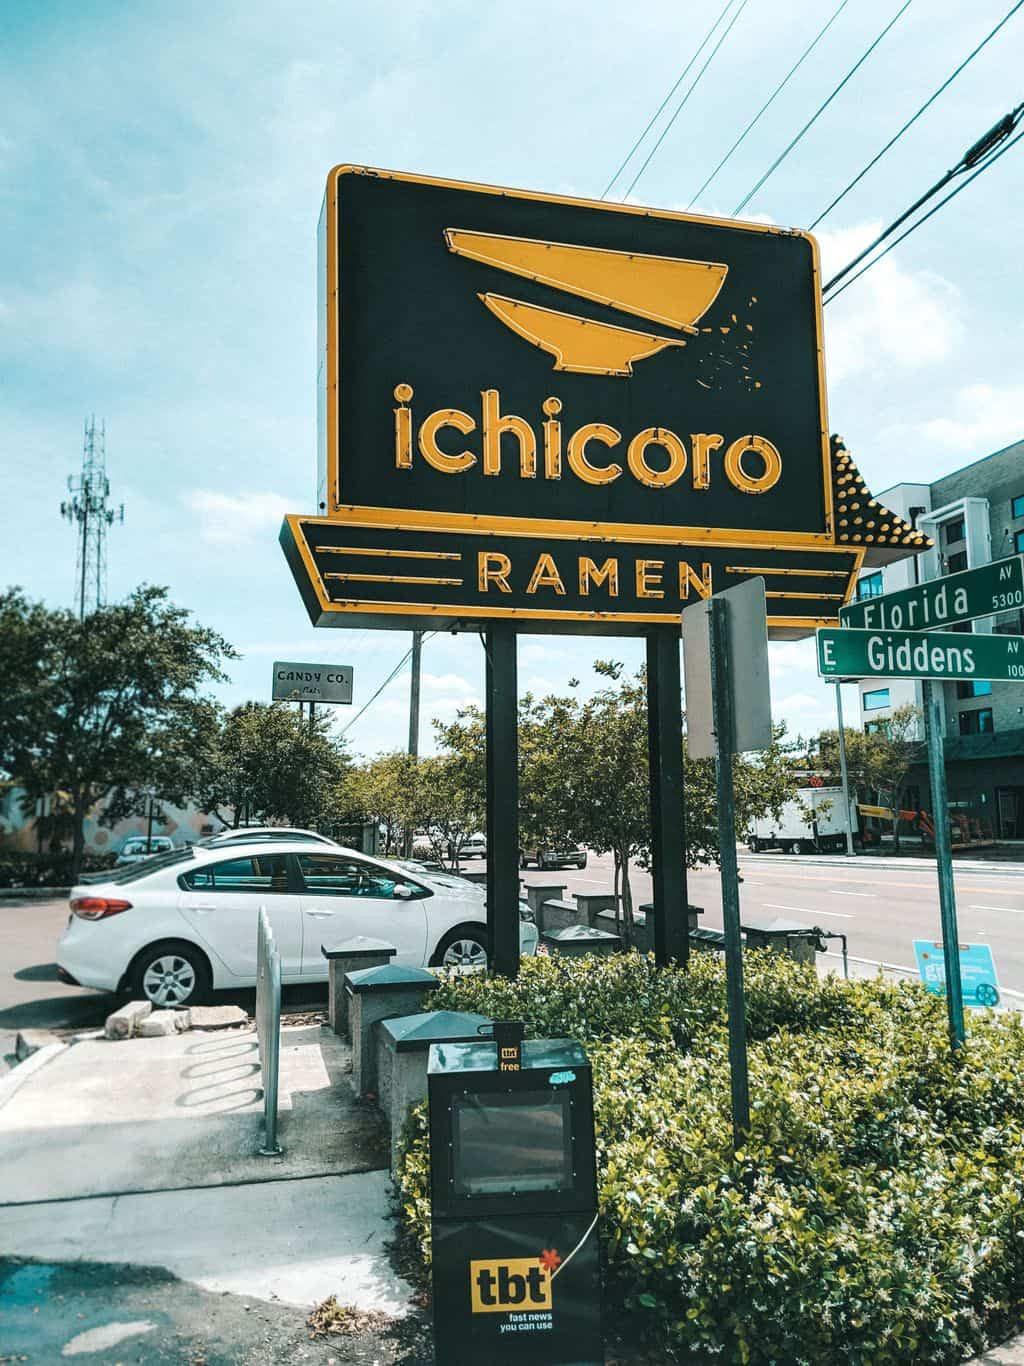 best Cuban sandwiches in Tampa